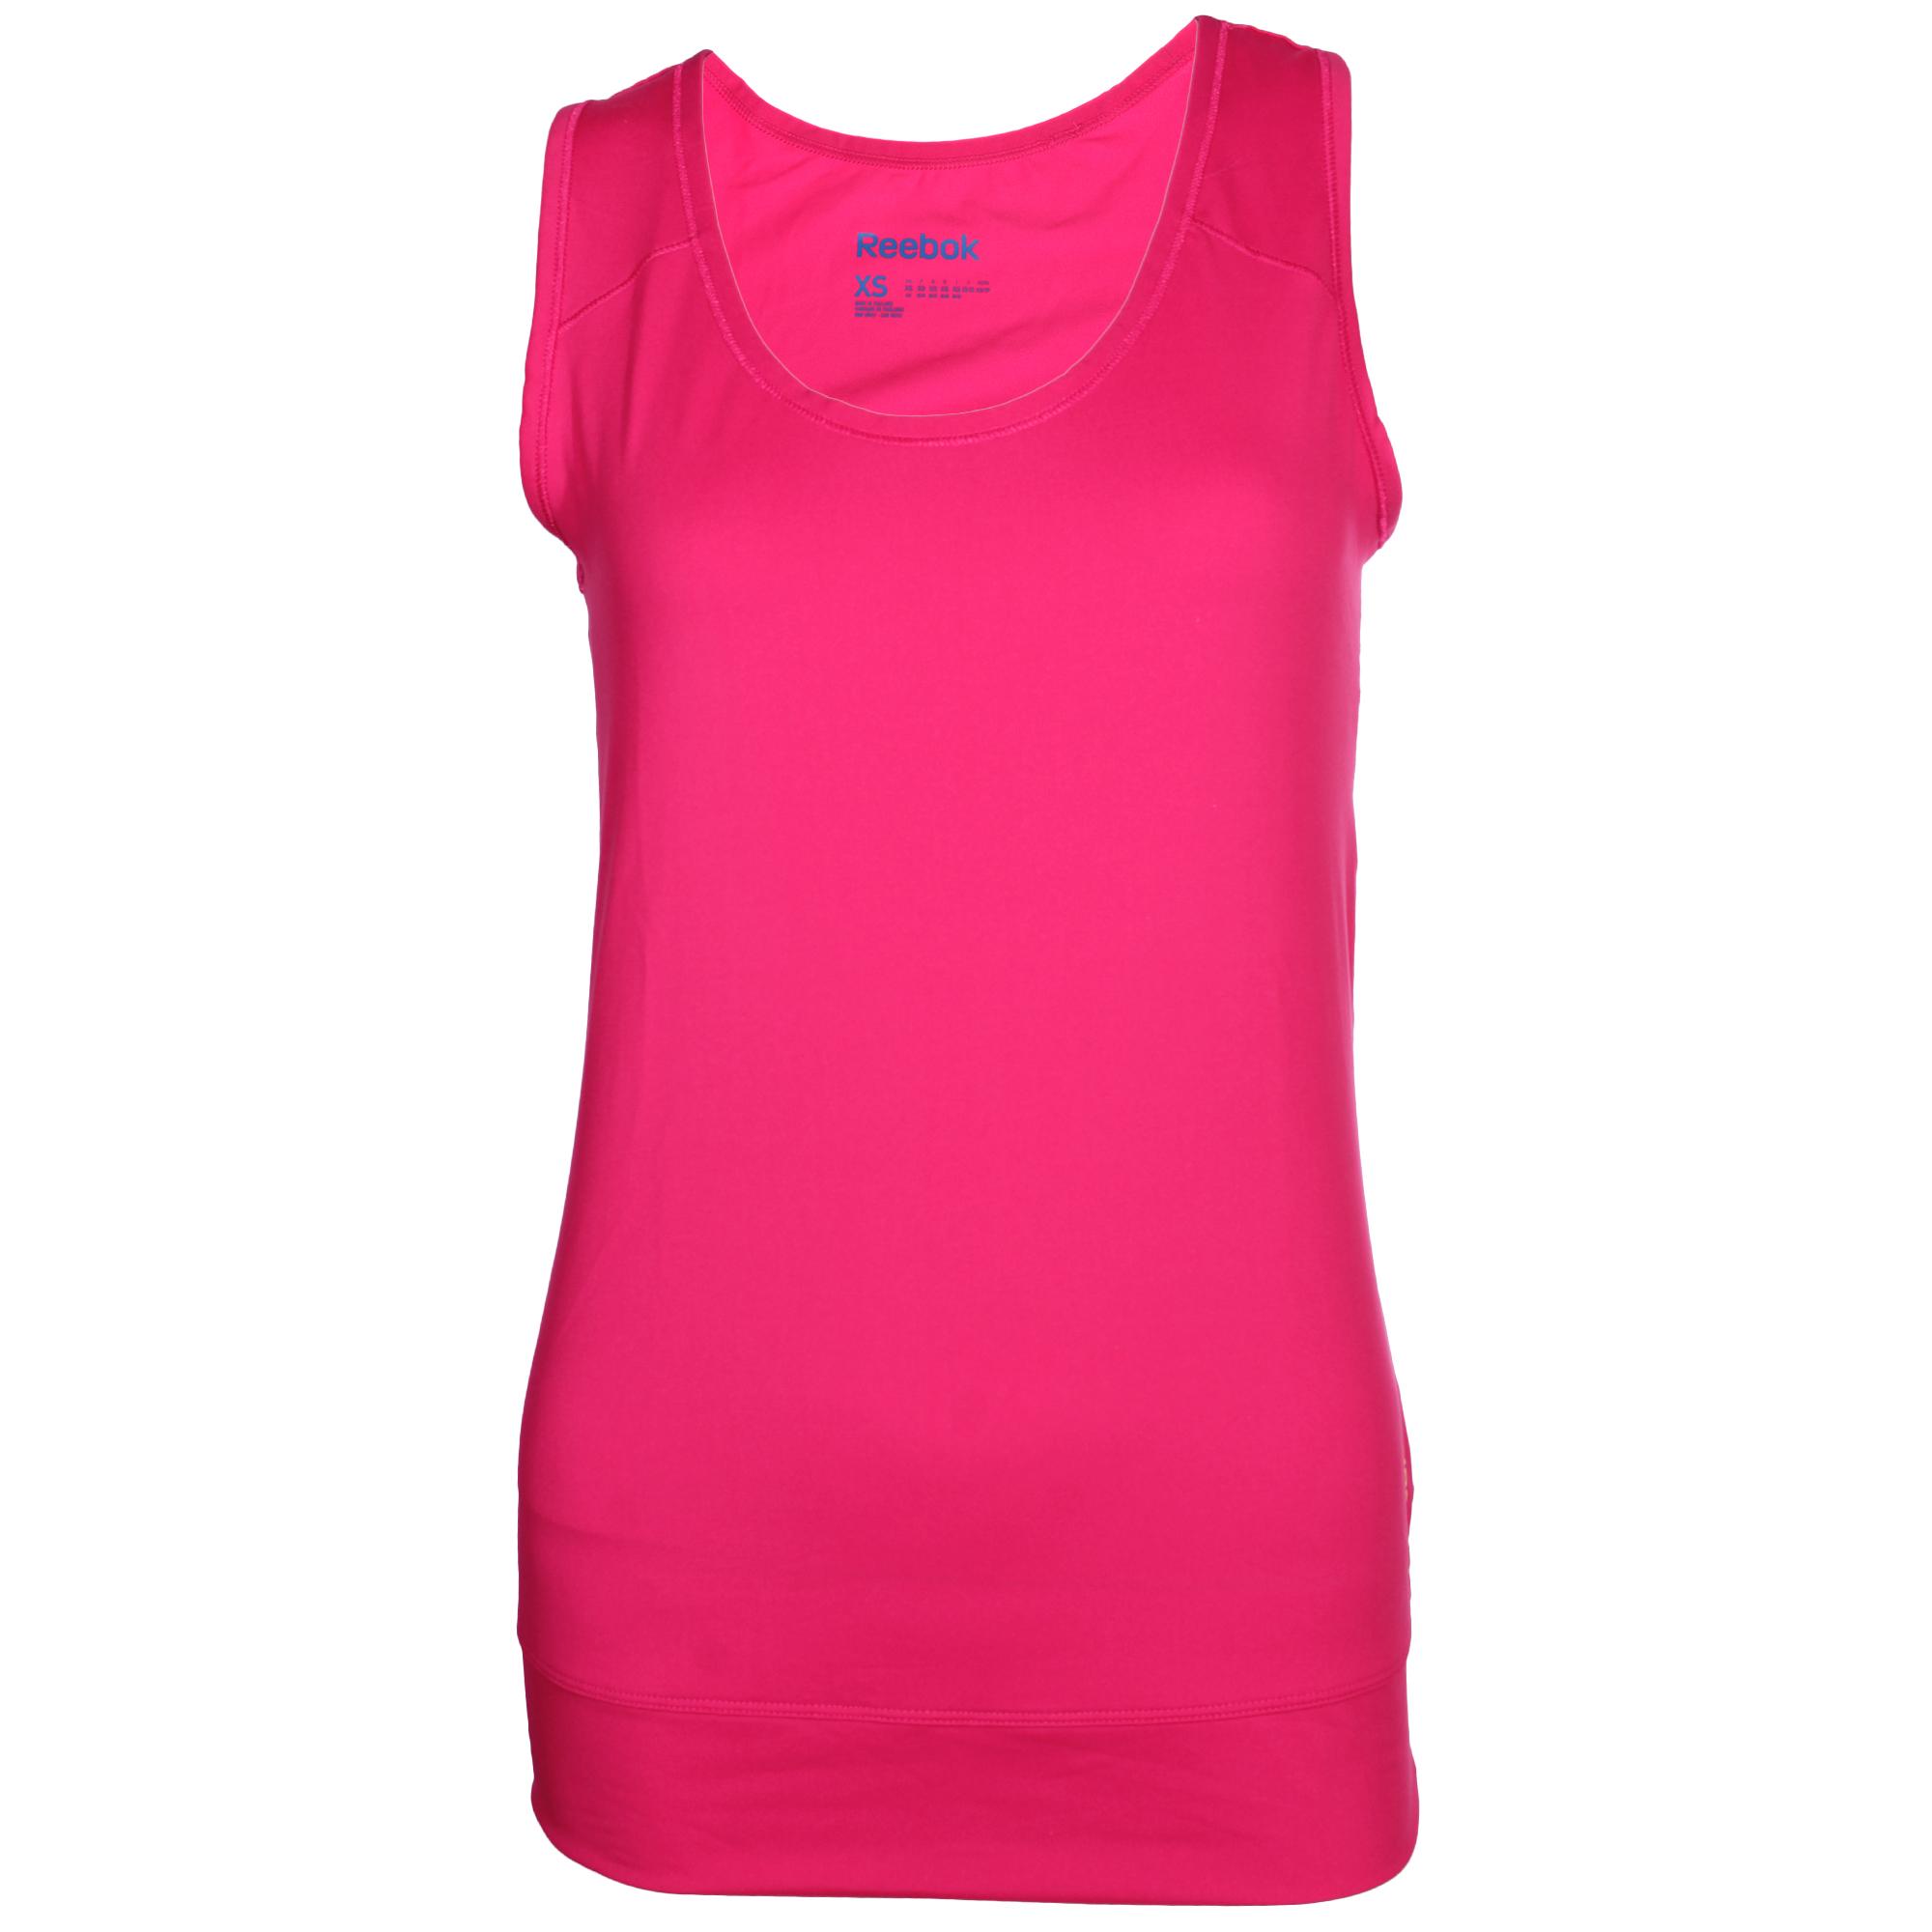 Reebok Trainingsshirt »training Essentials Marble Logo T-shirt« Pink